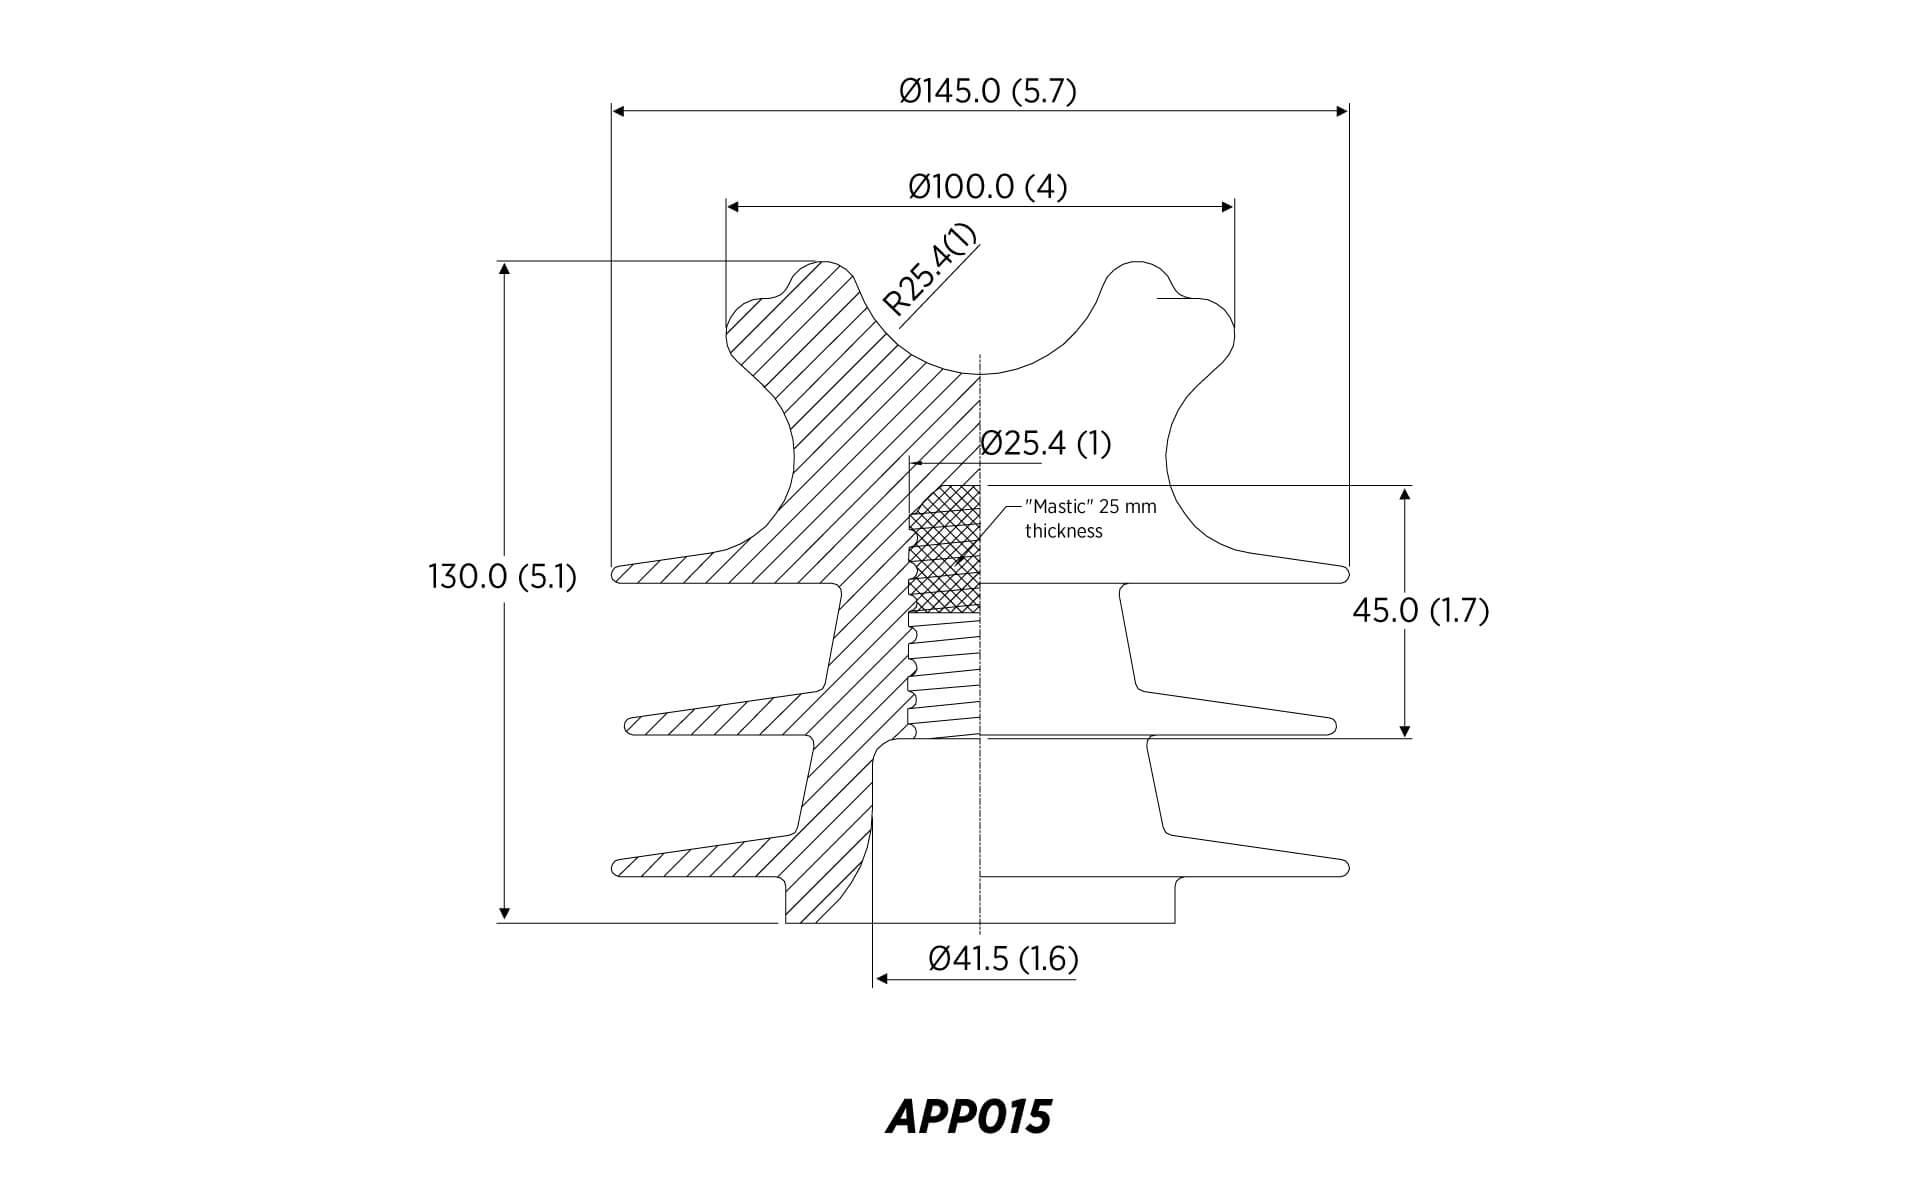 POLYETHYLENE PIN ANSI 55-4 15KV